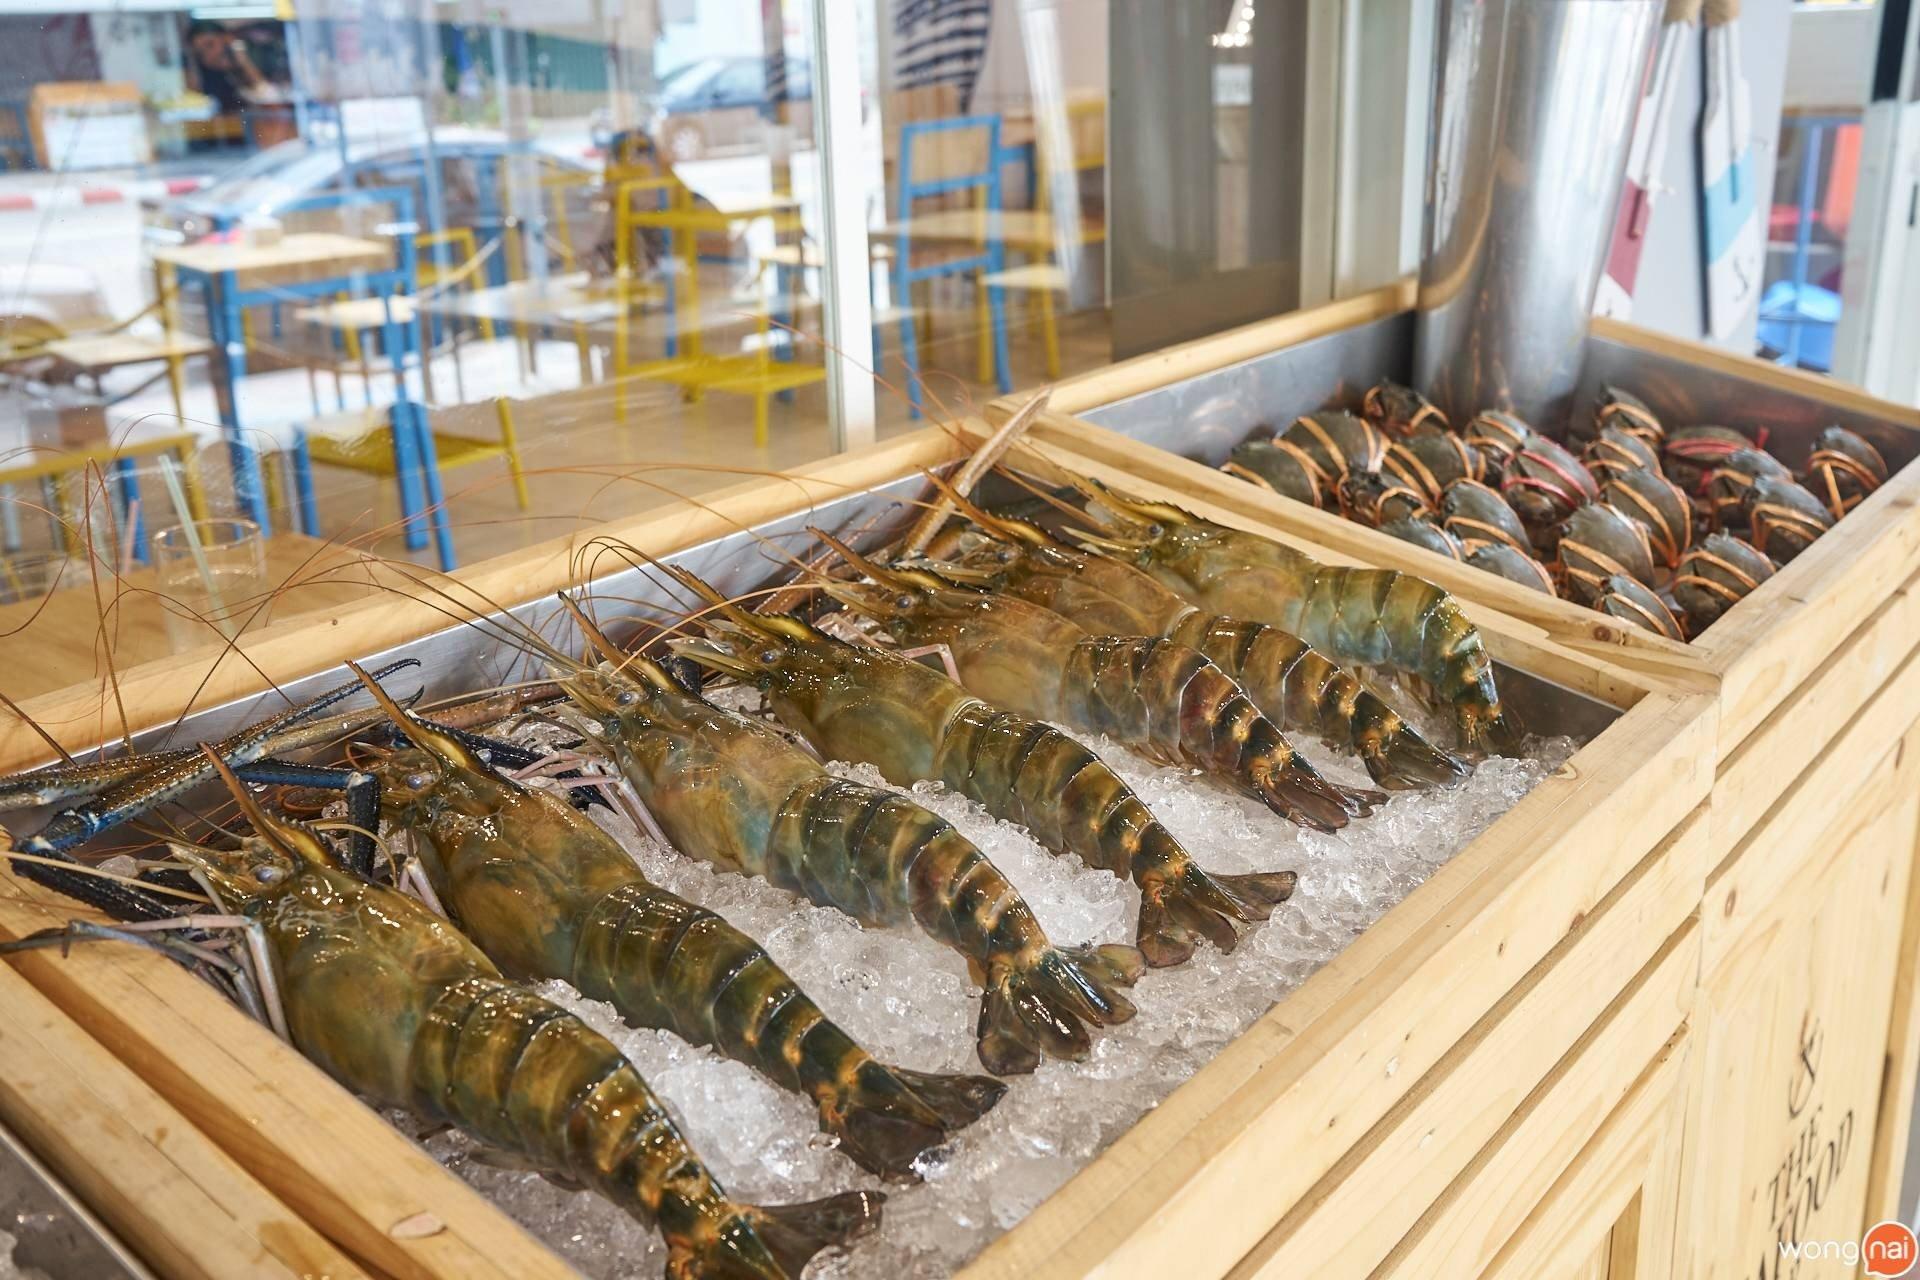 The Seafood Bar by ส้มตำคุณแดง